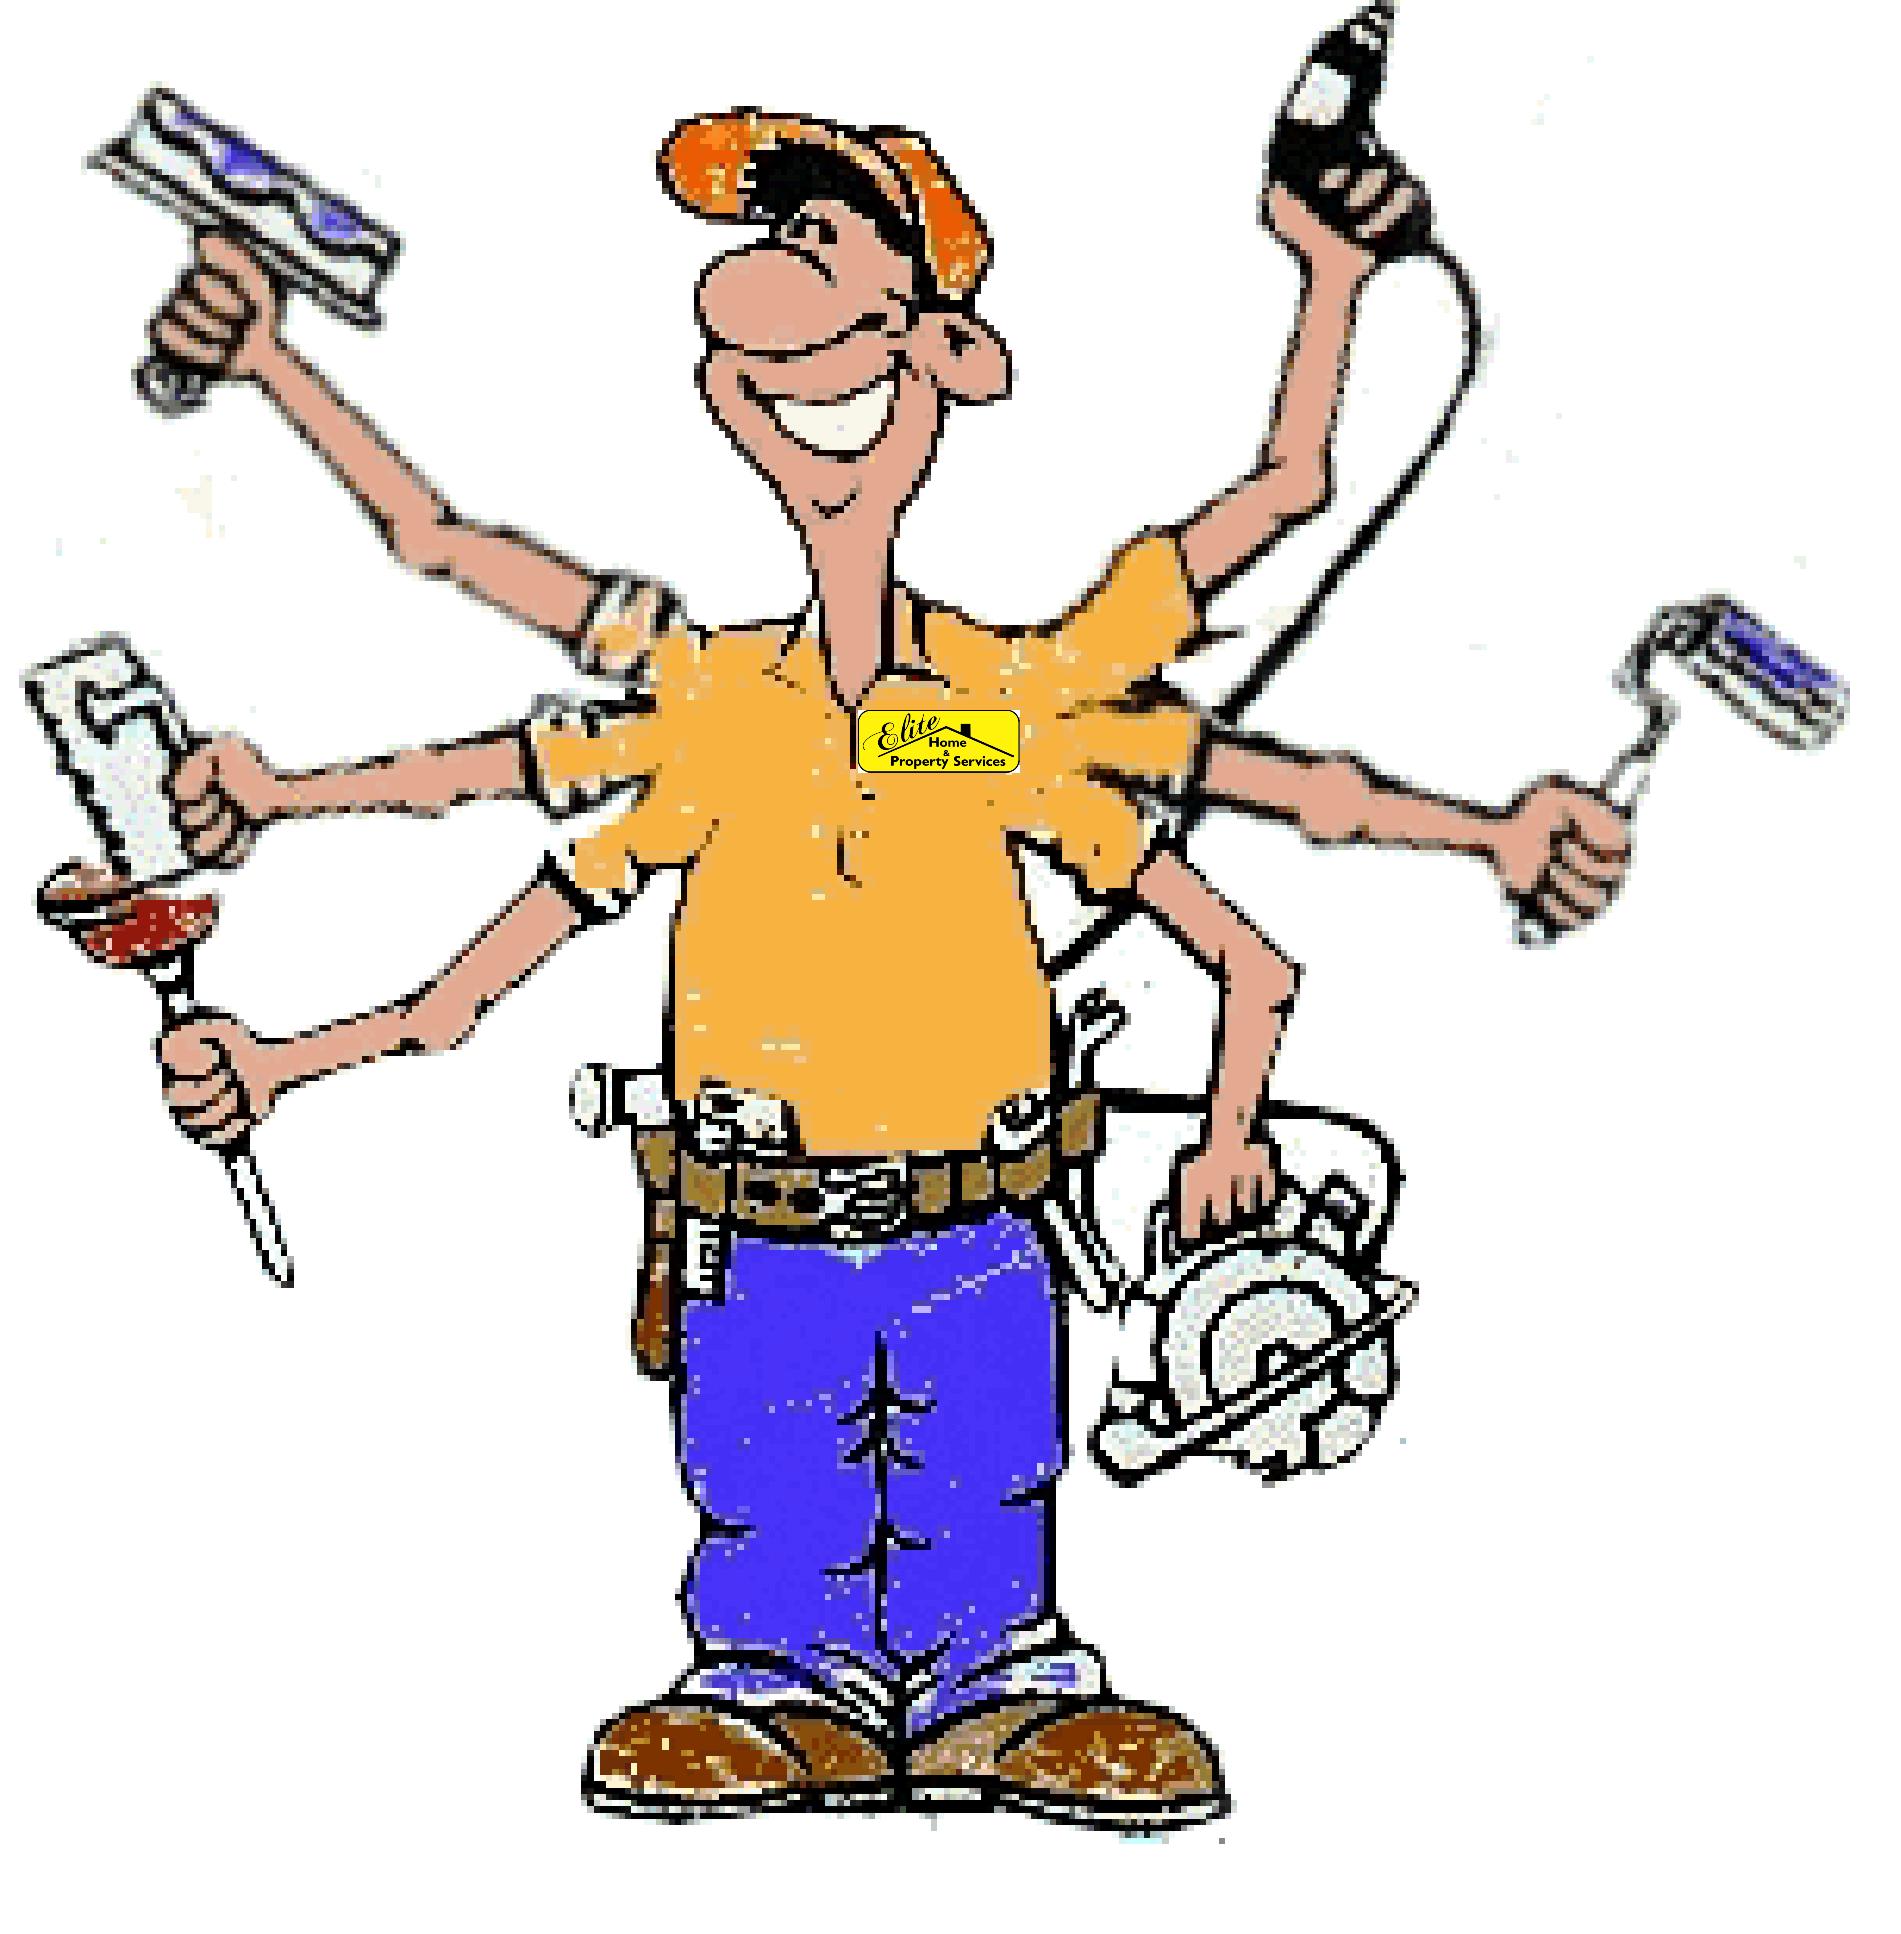 handyman clipart handyman logo clipart panda free clipart images rh clipartpanda com handyman clipart free download handyman clipart